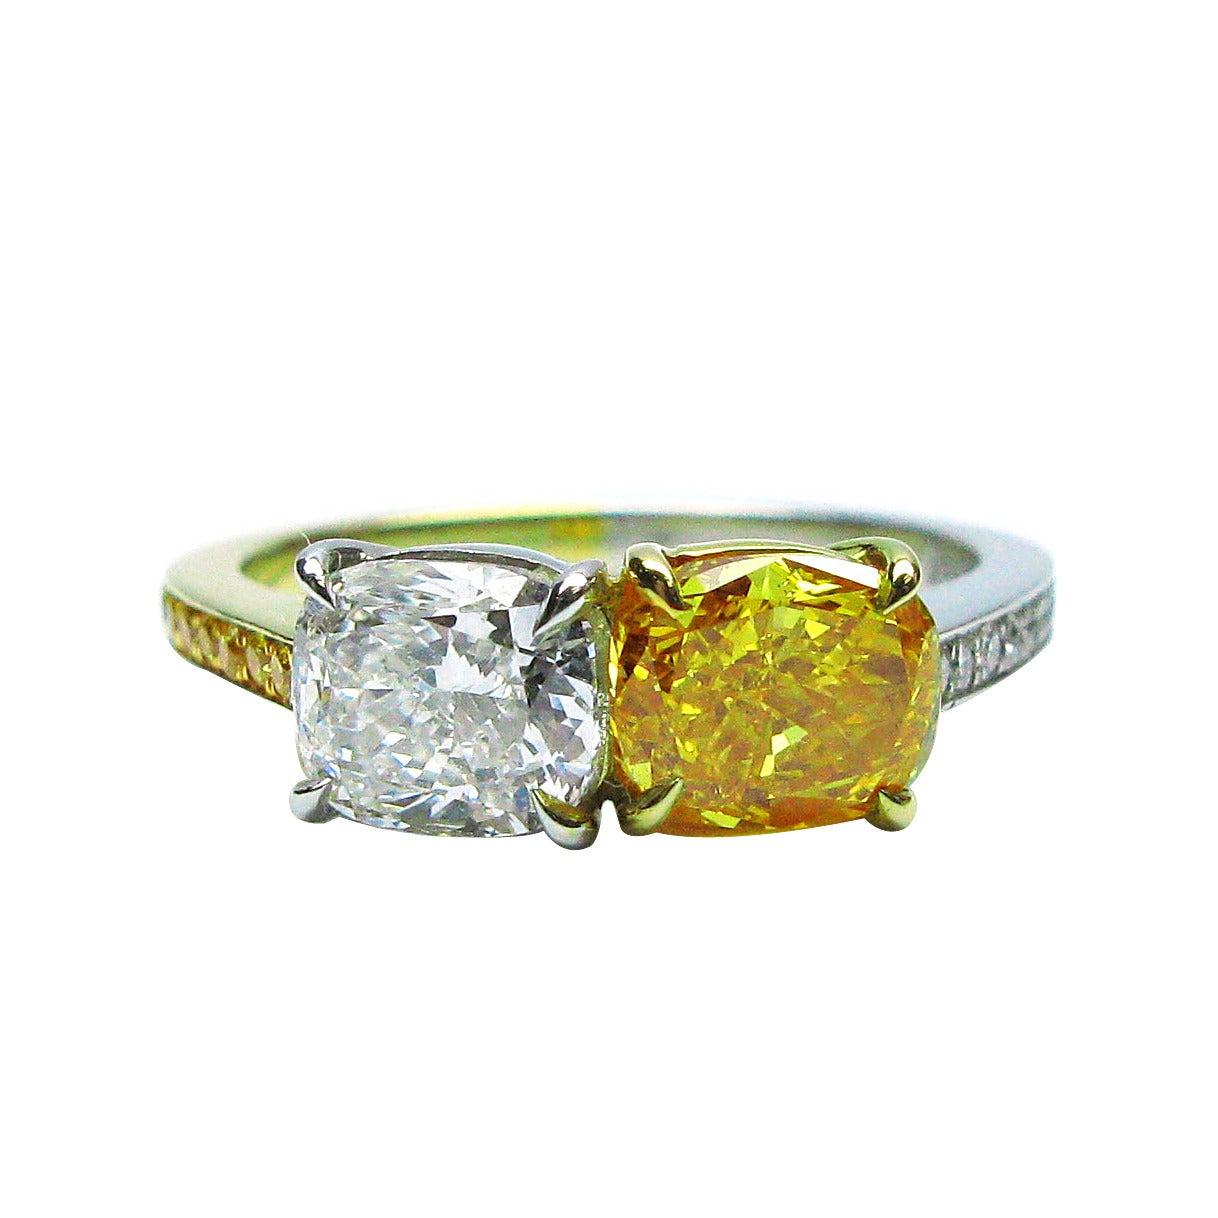 GIA Certified Vivid Orange and White Diamond Oval Twin Ring